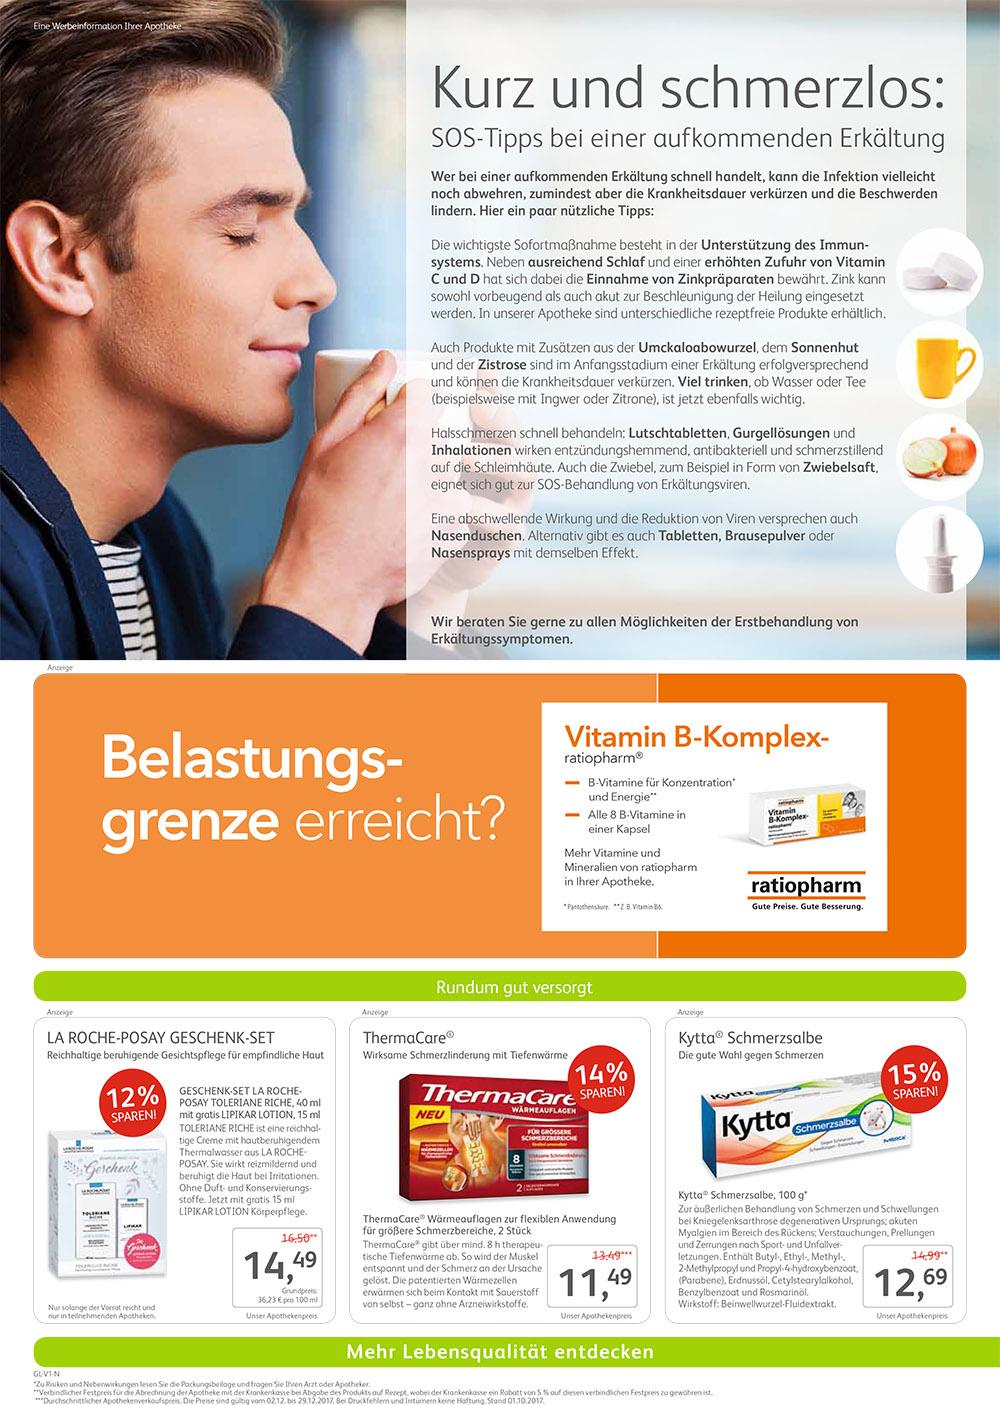 http://www.apotheken.de/fileadmin/clubarea/00000-Angebote/67459_5899_rehbach_angebot_2.jpg